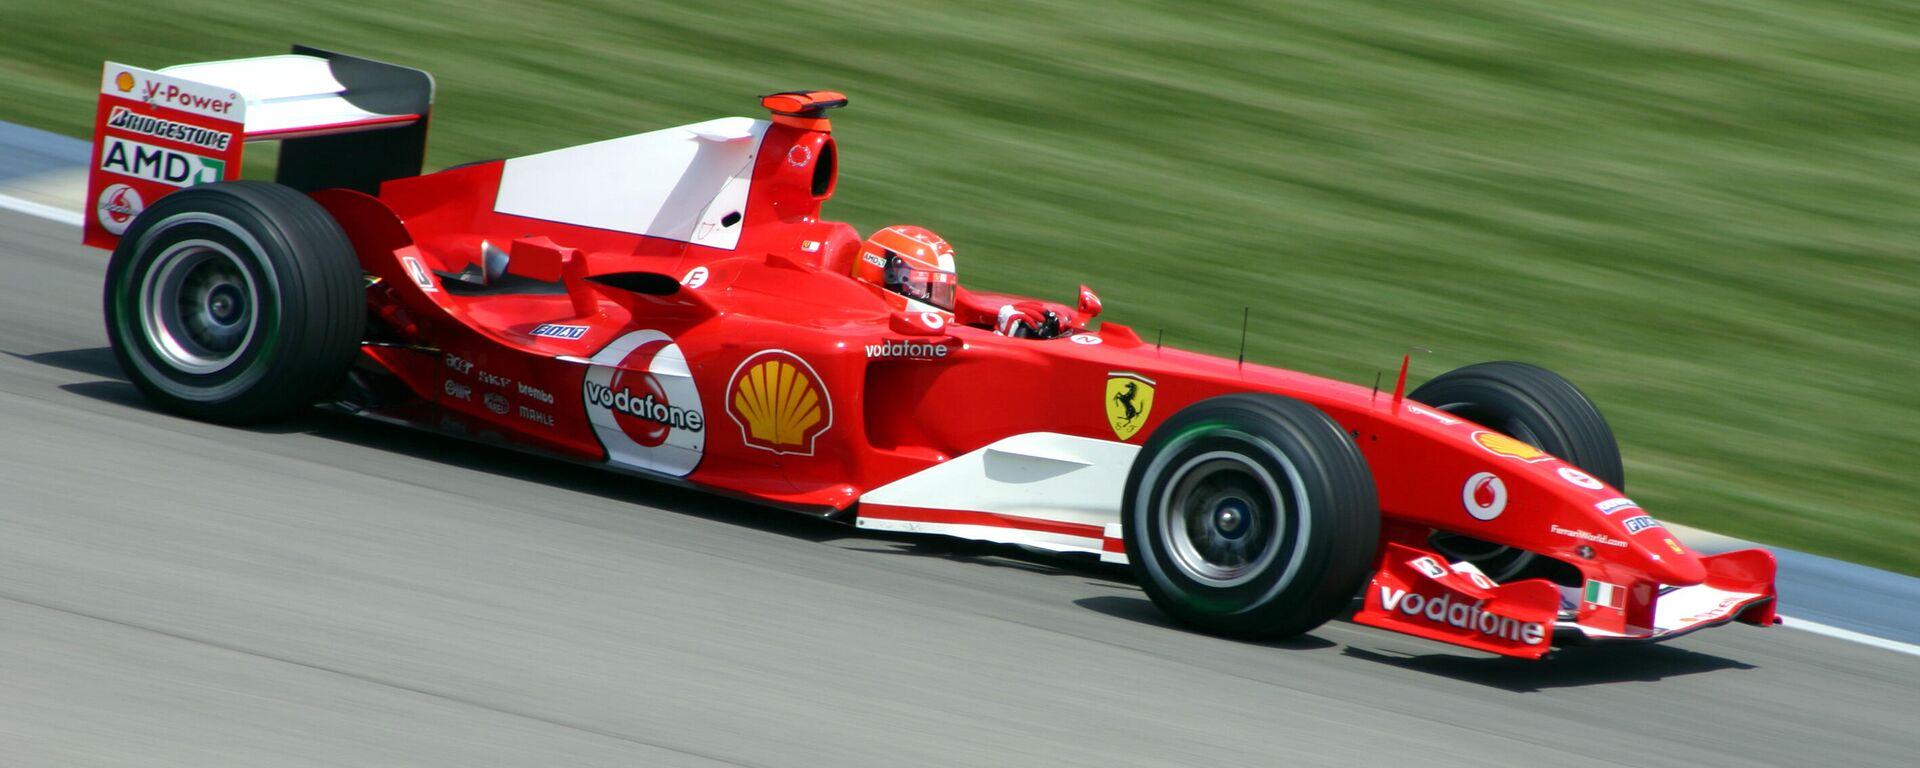 Michael Schumacher, United States Grand Prix, Indianapolis, 2004 - SNA, 1920, 14.09.2021